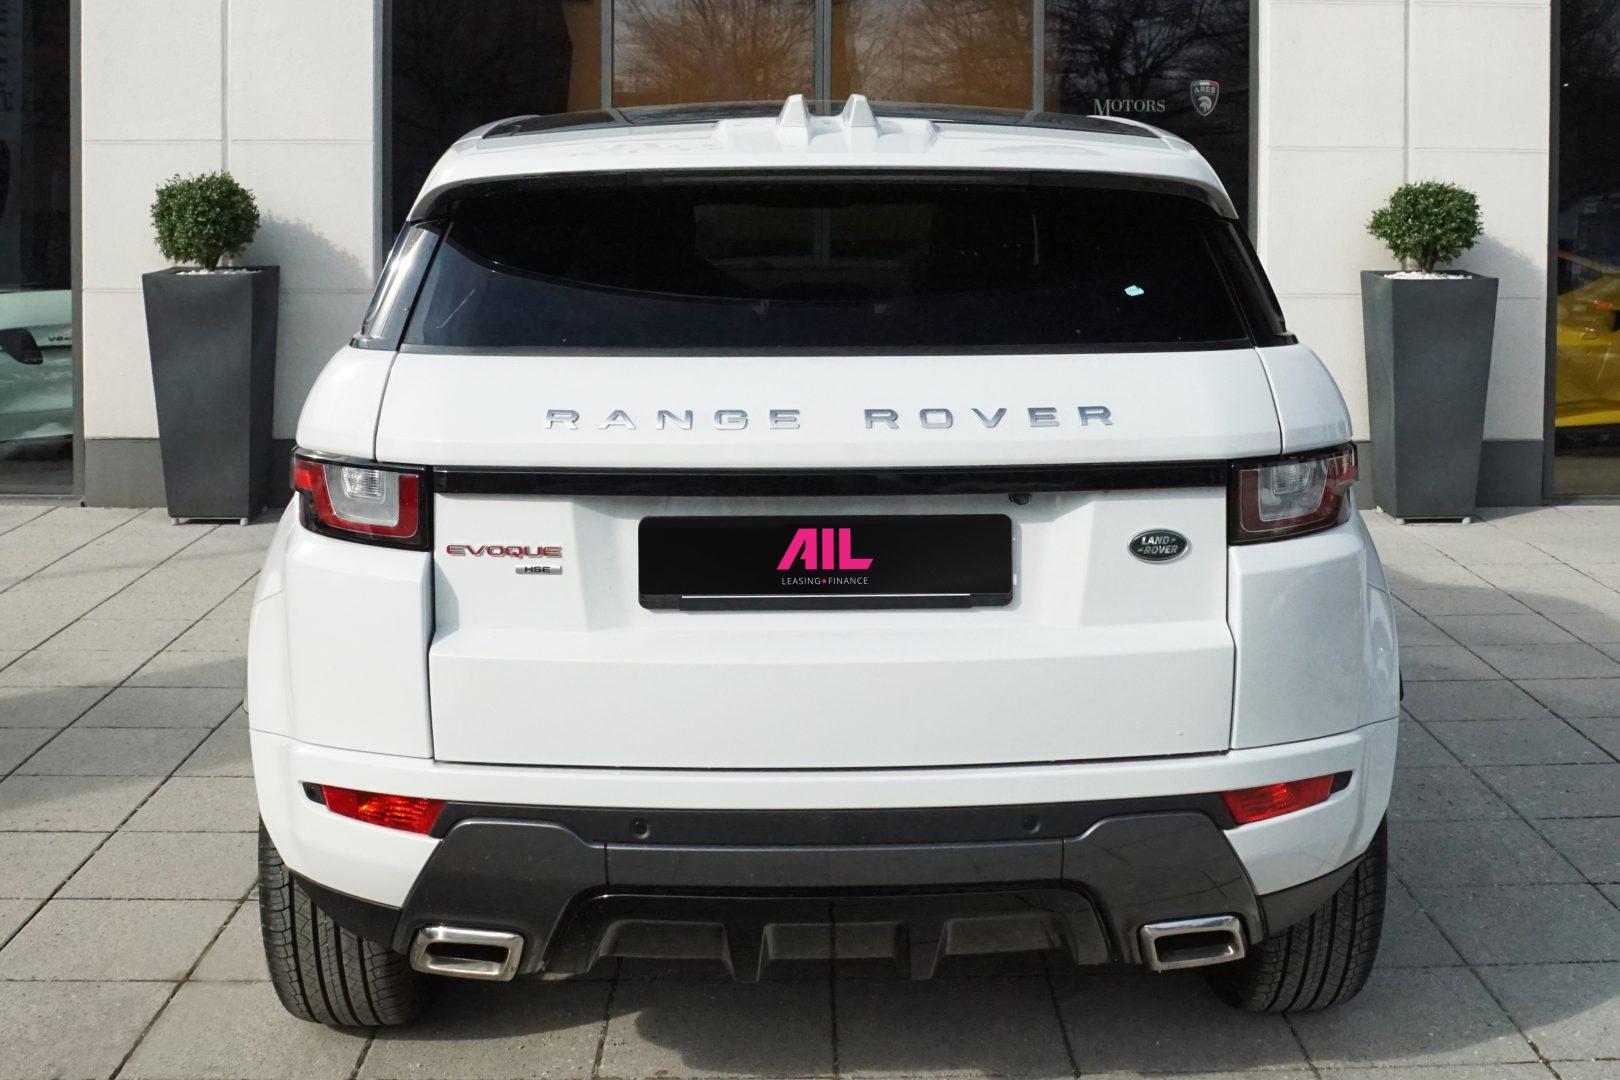 AIL Land Rover Range Rover Evoque HSE Dynamic 2.0 TD4  2